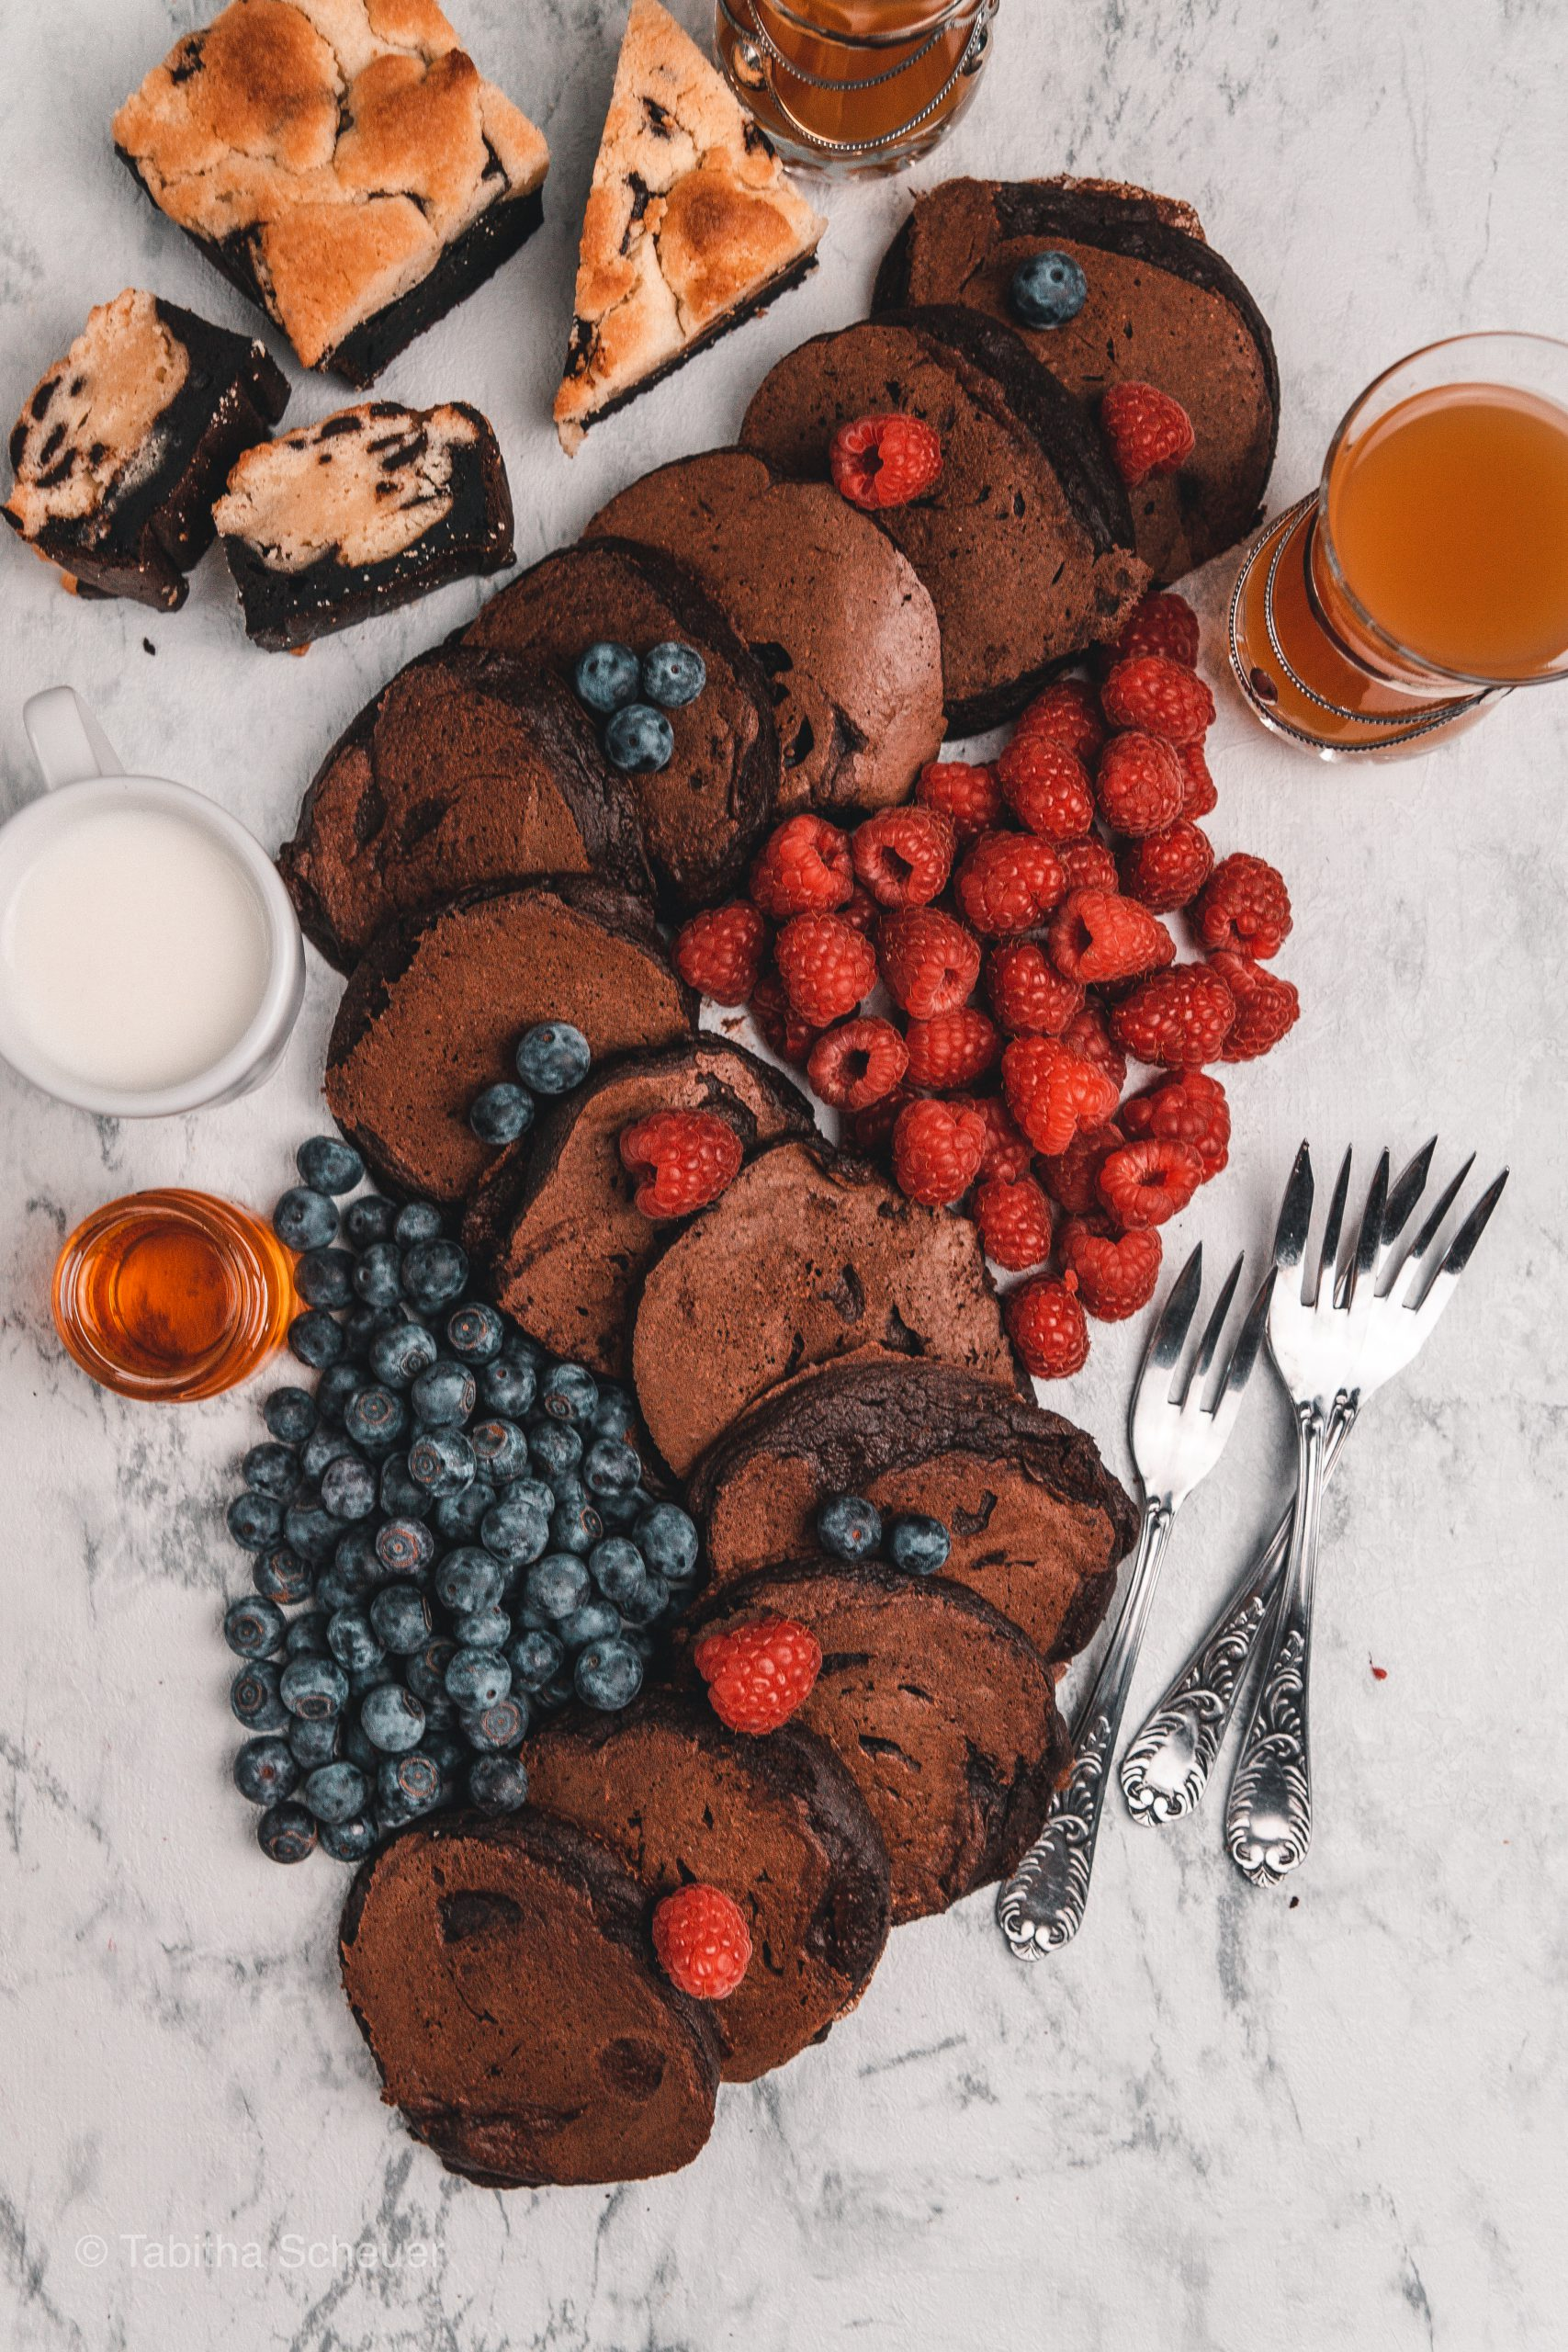 mariashealthytreats Rezept für Schoko-Pancakes